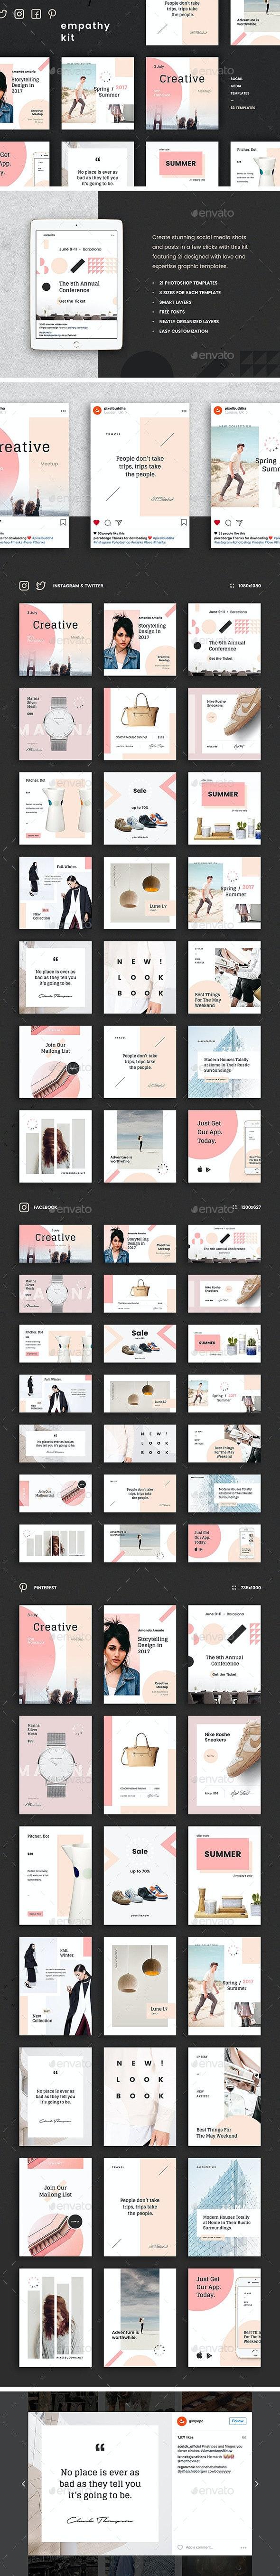 Empathy Social Media Kit: Instagram, Pinterest, Twitter & Facebook Templates - Social Media Web Elements